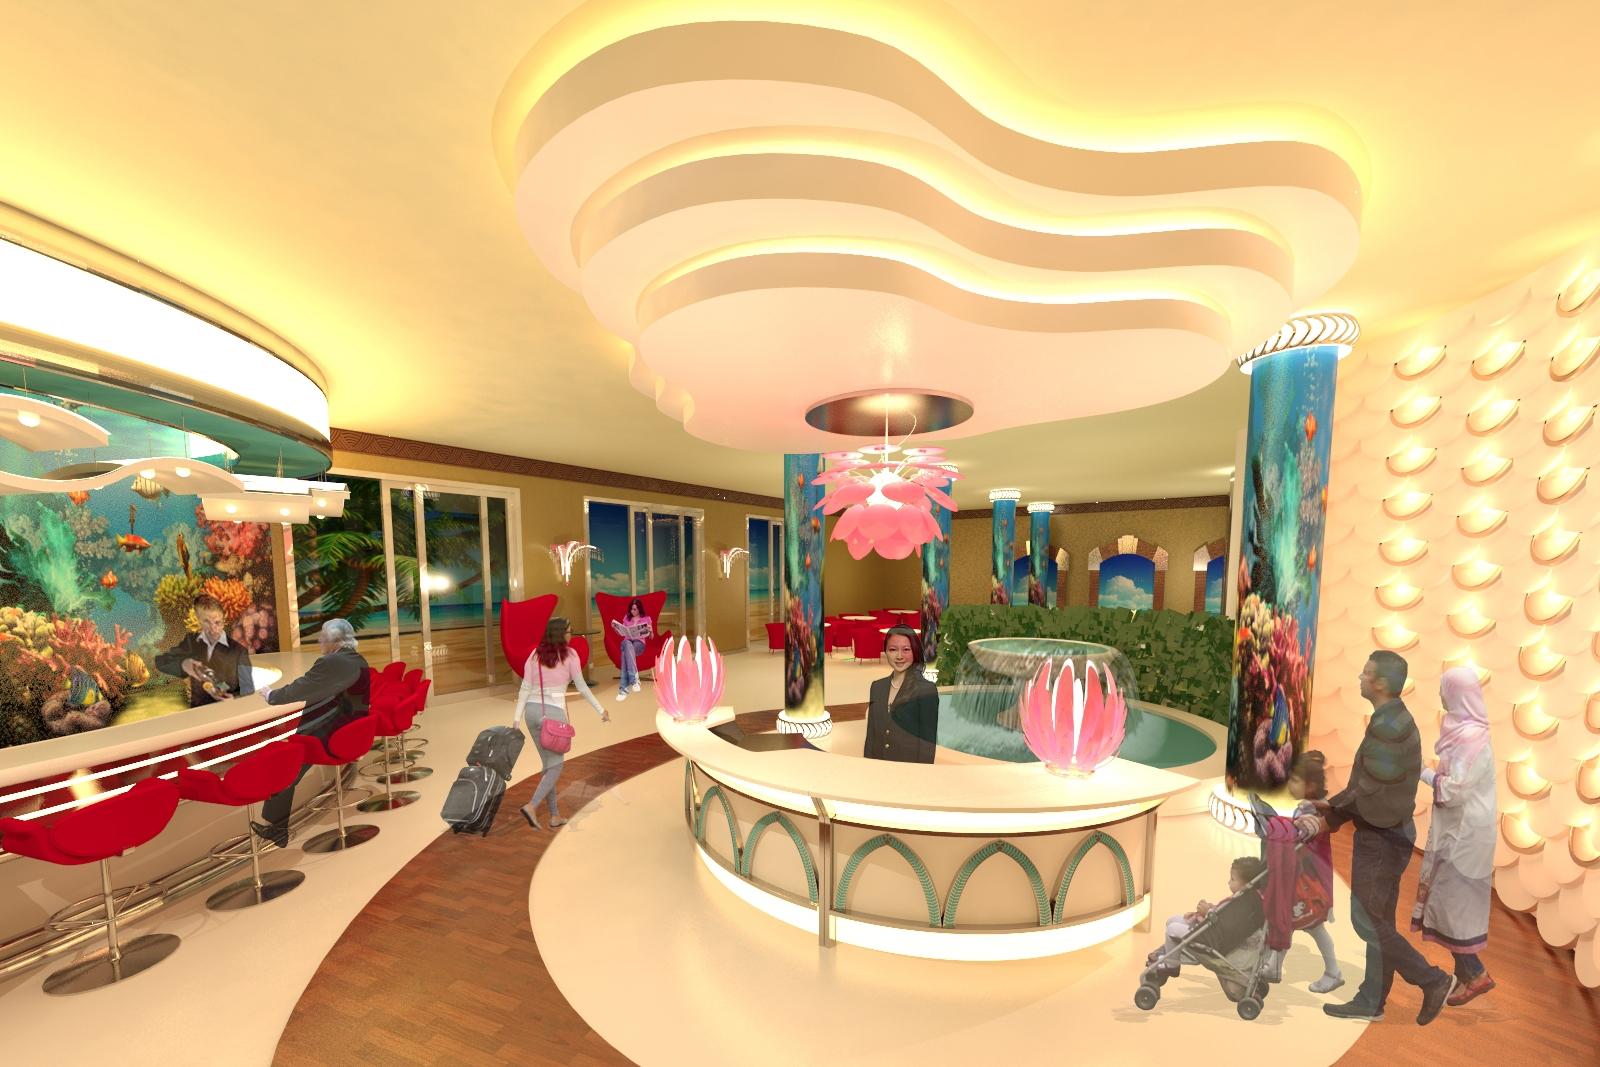 Hotel Grand Lobby - Dubai, UAE